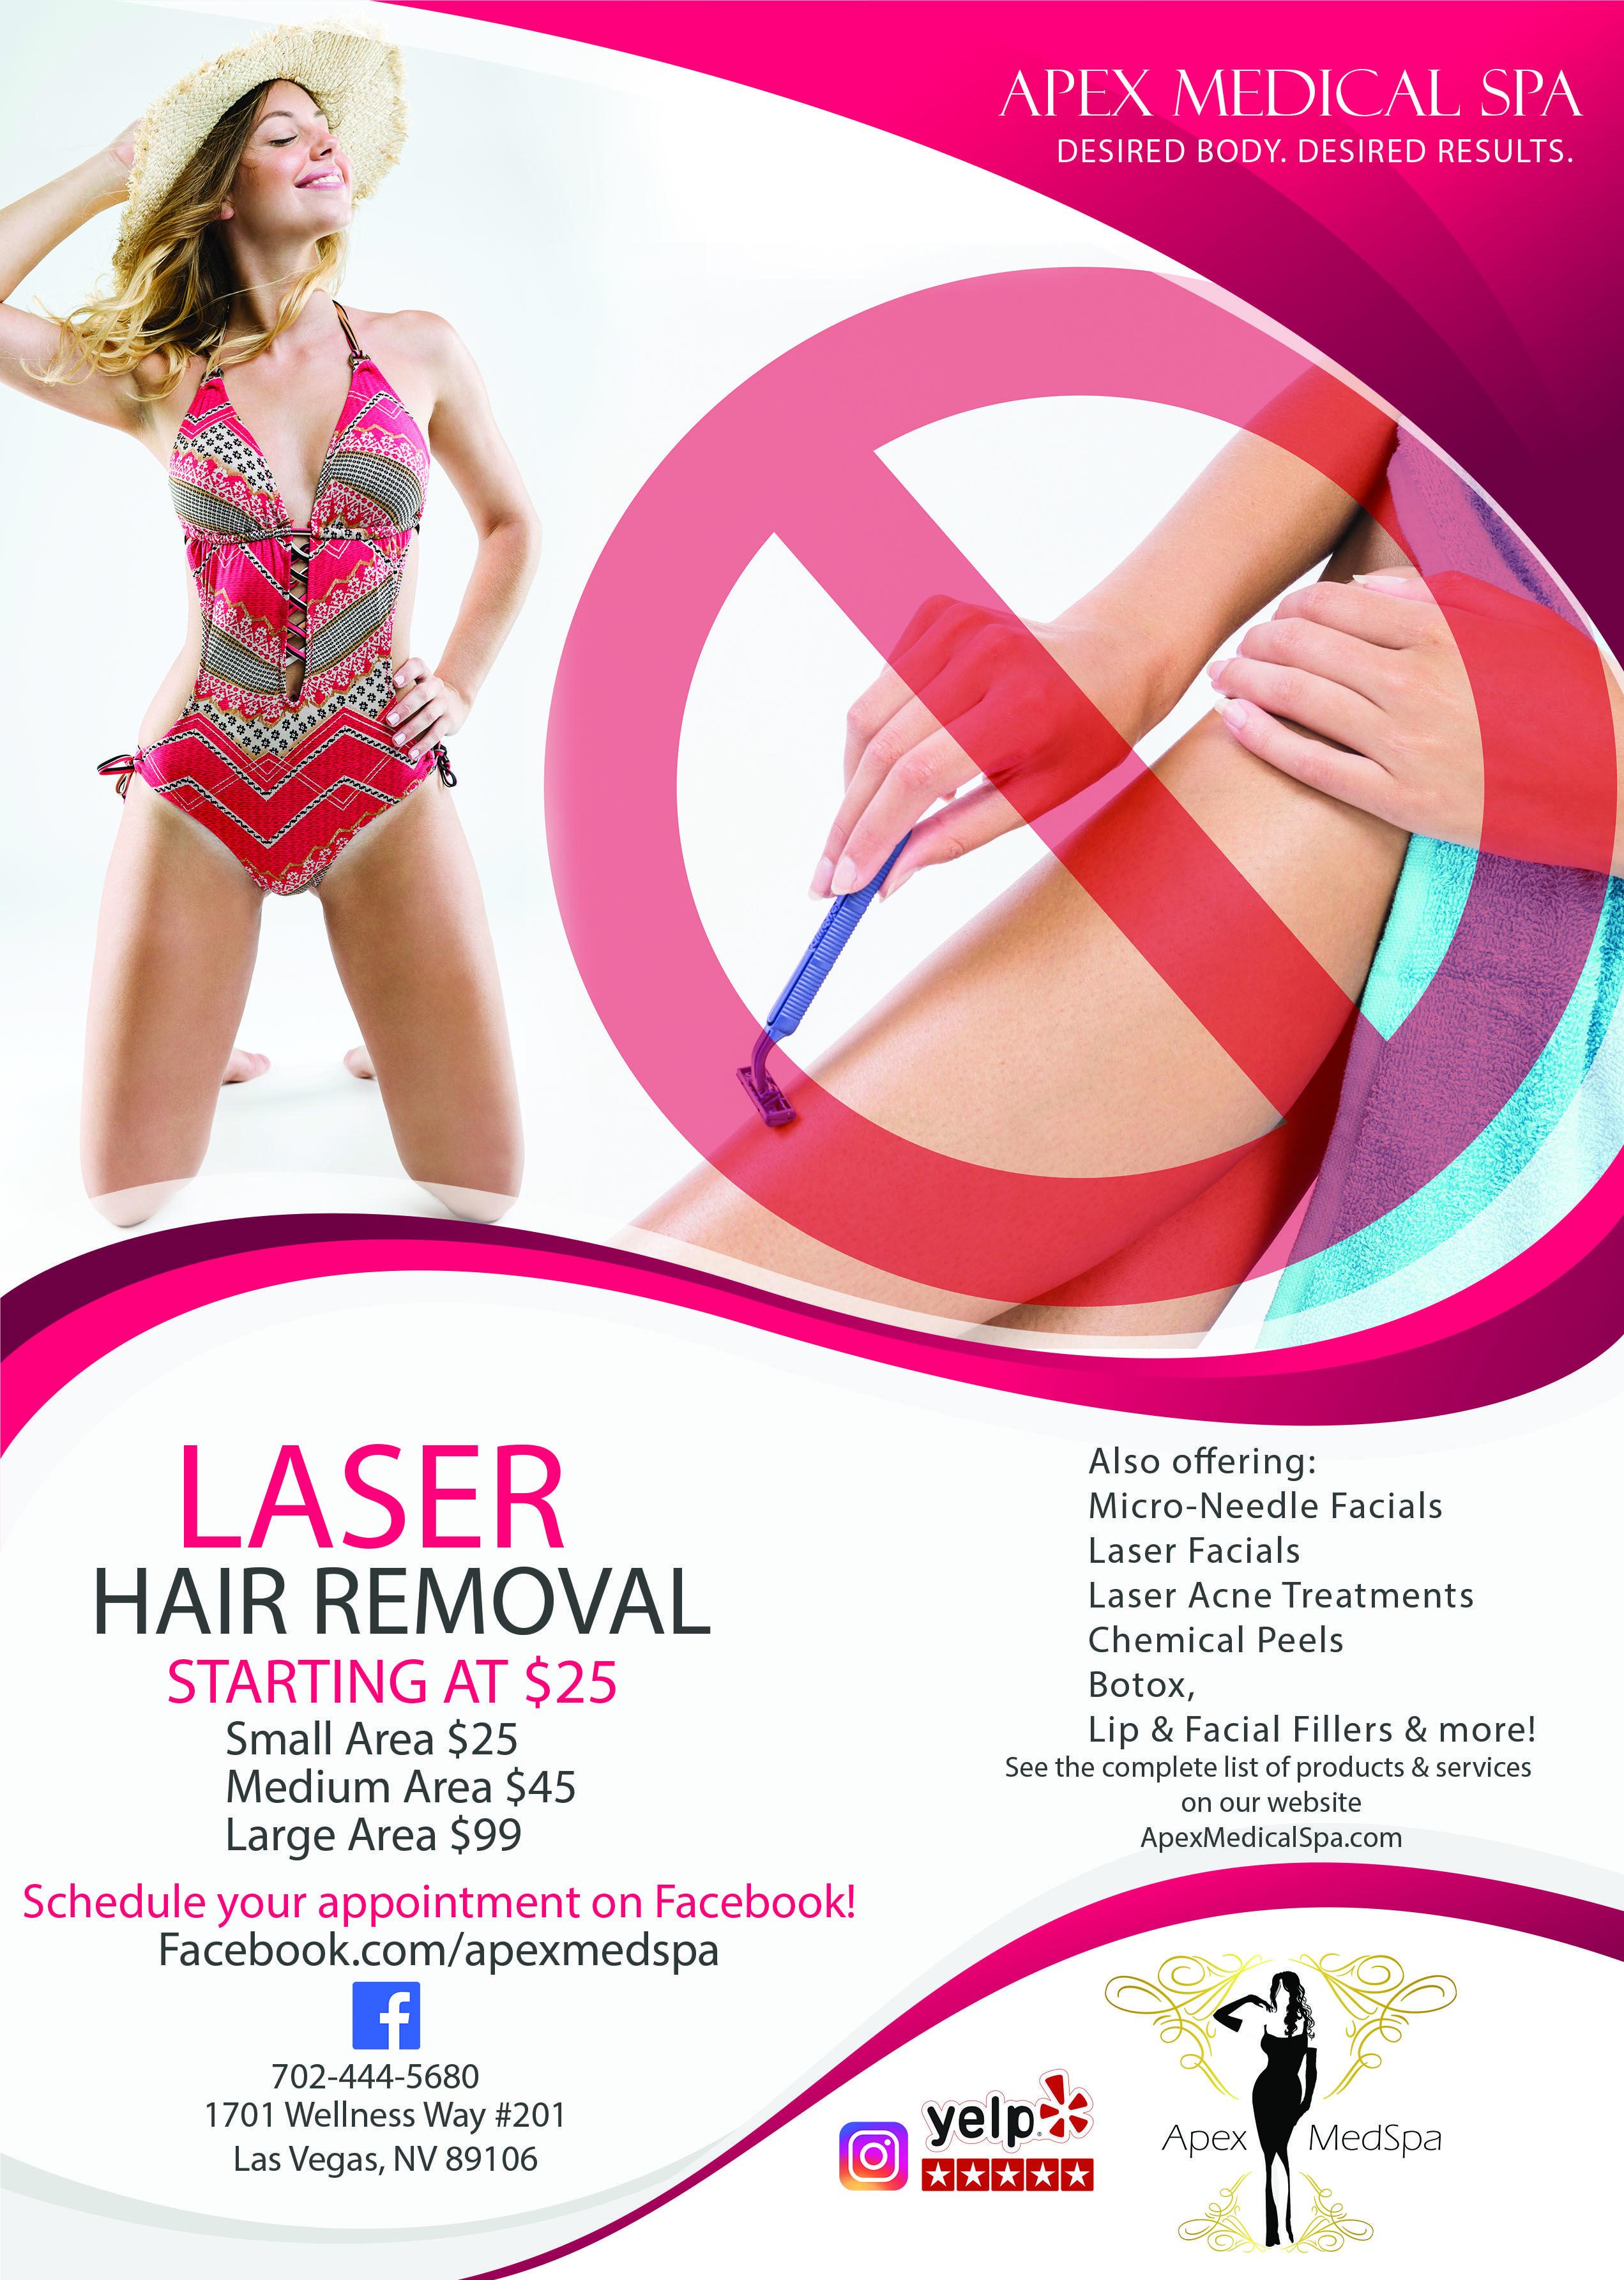 Laser Hair Removal Las Vegas Laser Facial Hair Removal Laser Hair Removal Laser Acne Treatment